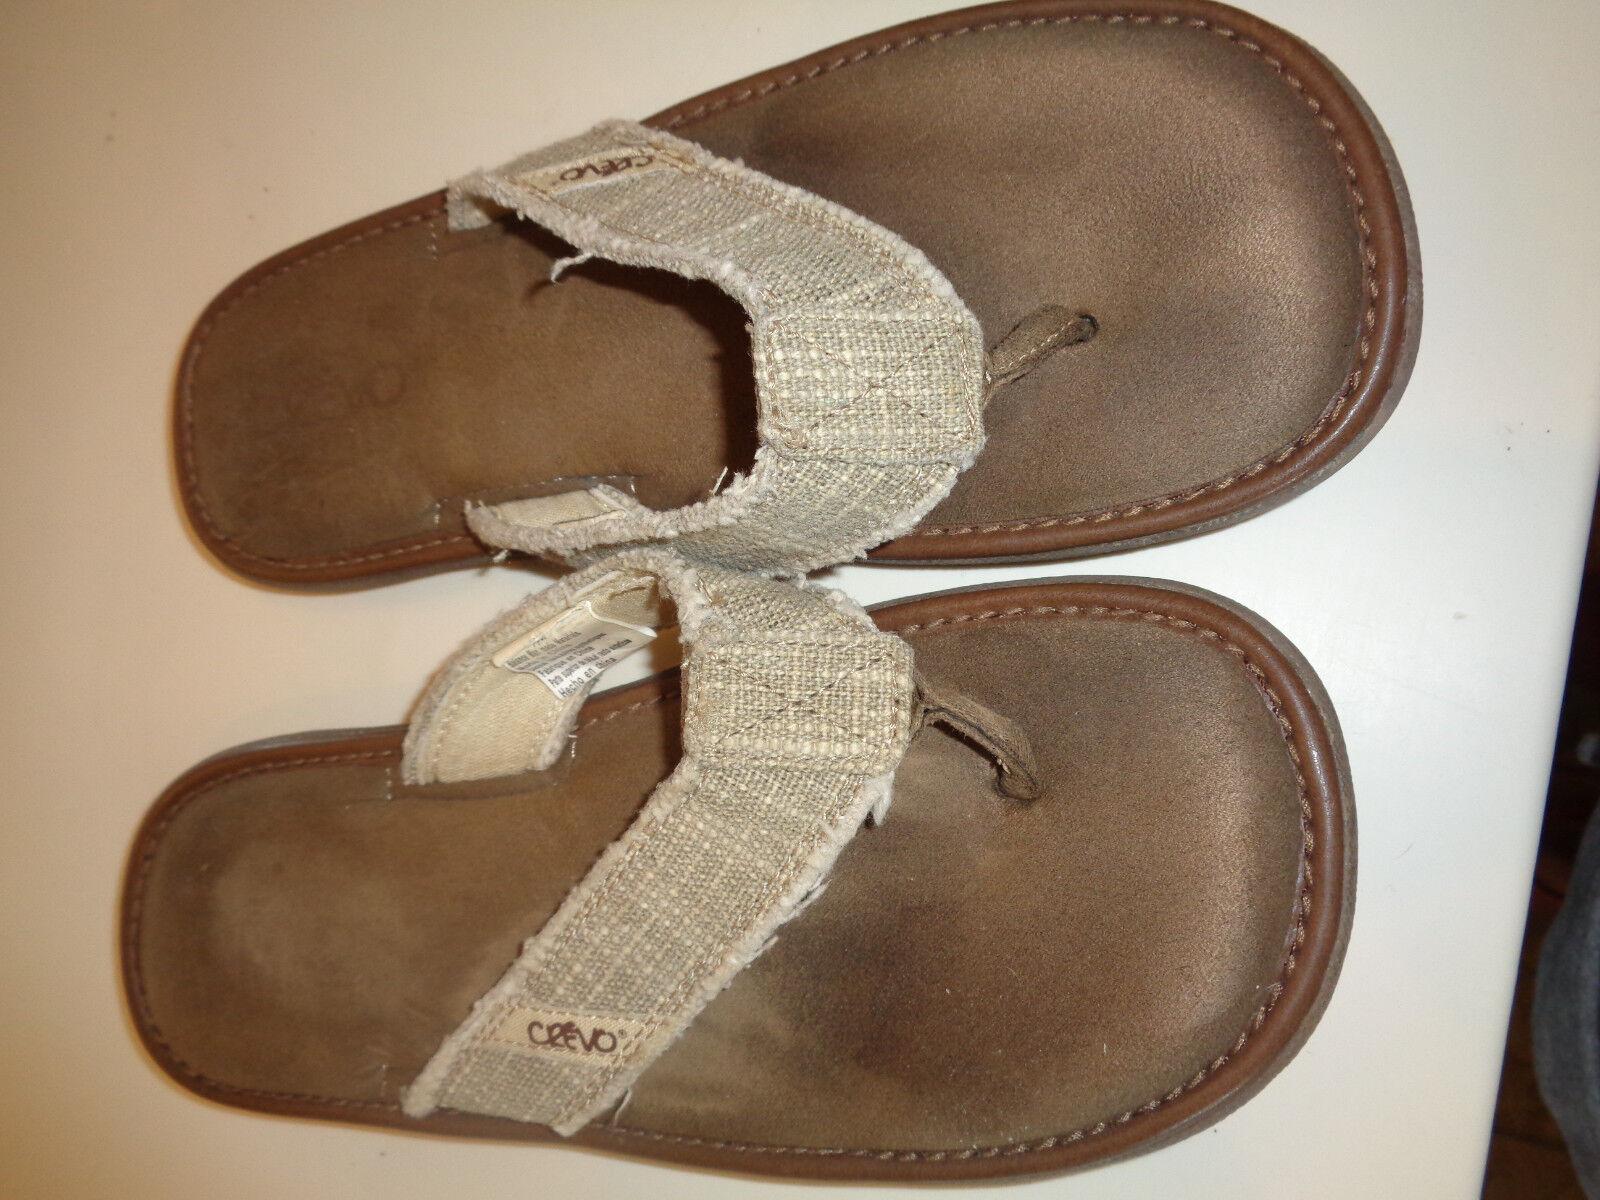 Mens  Crevo Monterey Flip Flops Sandals Chocolate Brown  Mens SZ  6 GUC ab14e1